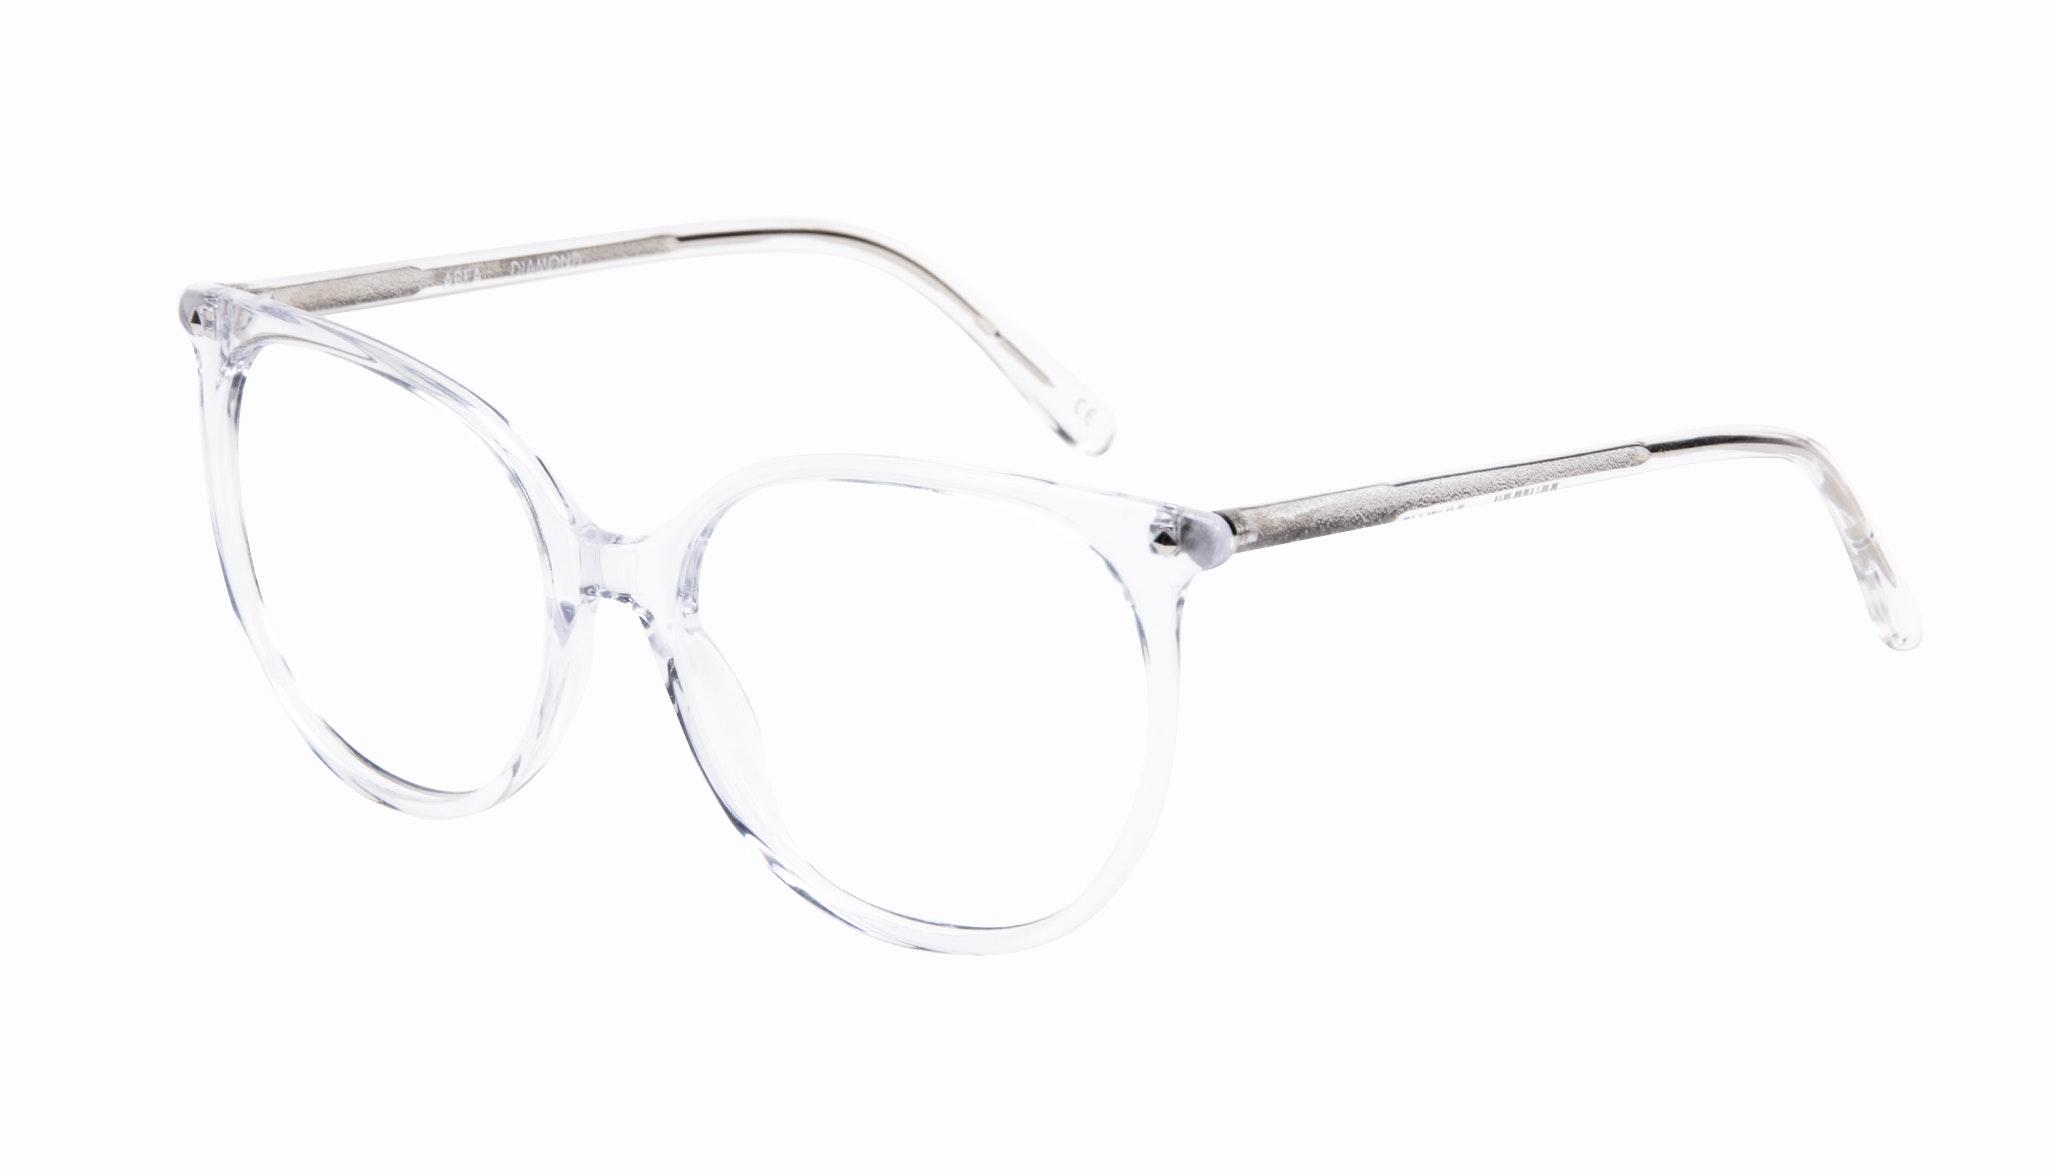 Affordable Fashion Glasses Cat Eye Square Eyeglasses Women Area Diamond Tilt